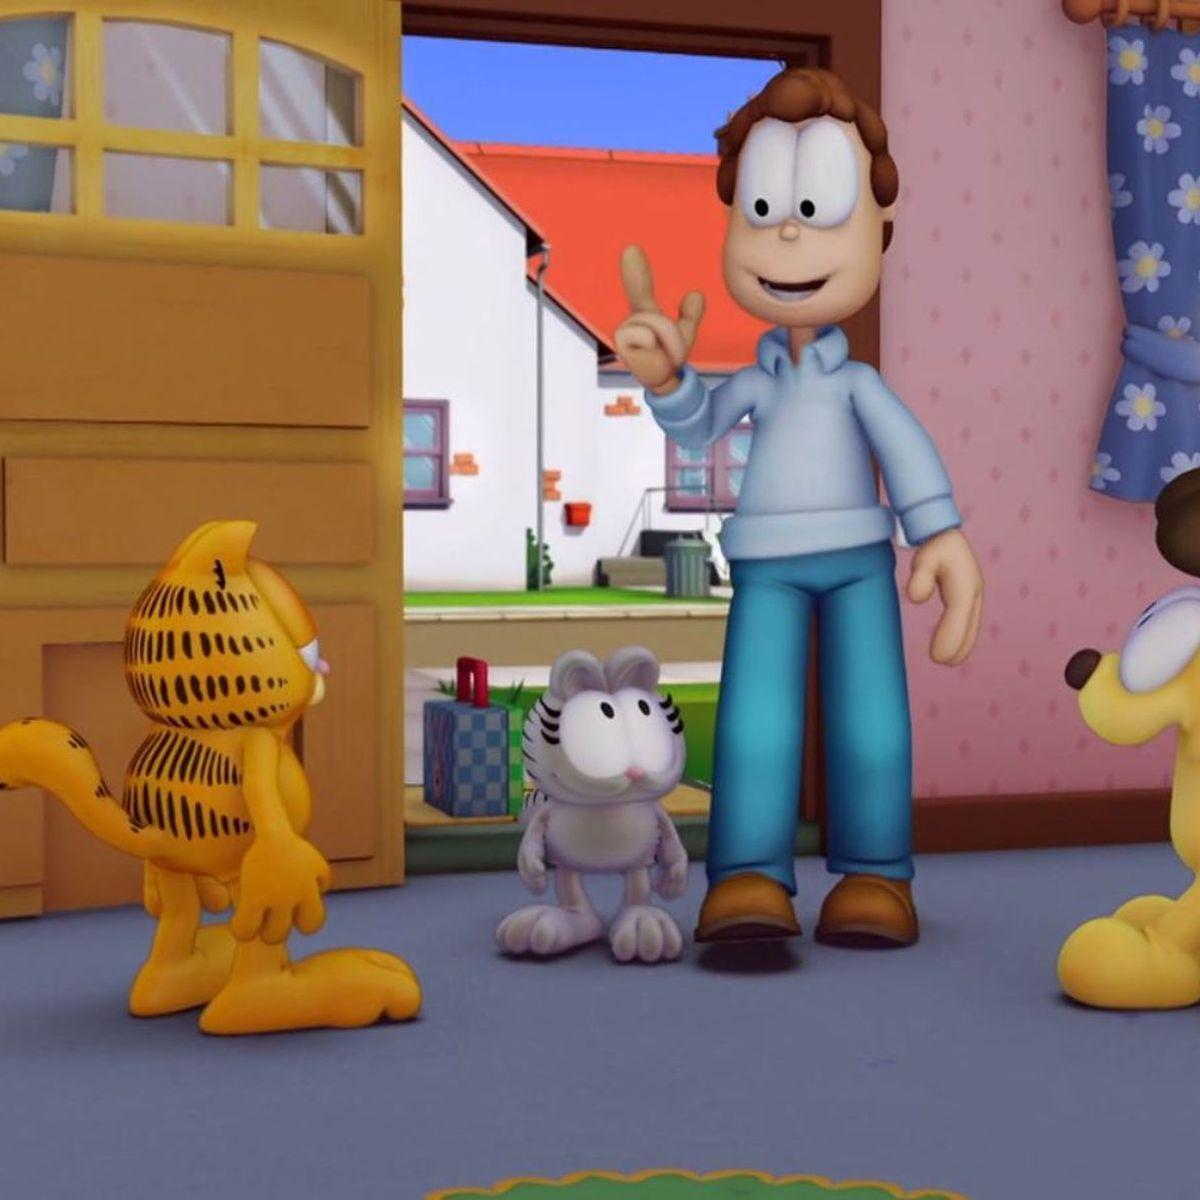 Garfield E Brezhoneg Garfield En Breton Nermal En Ti